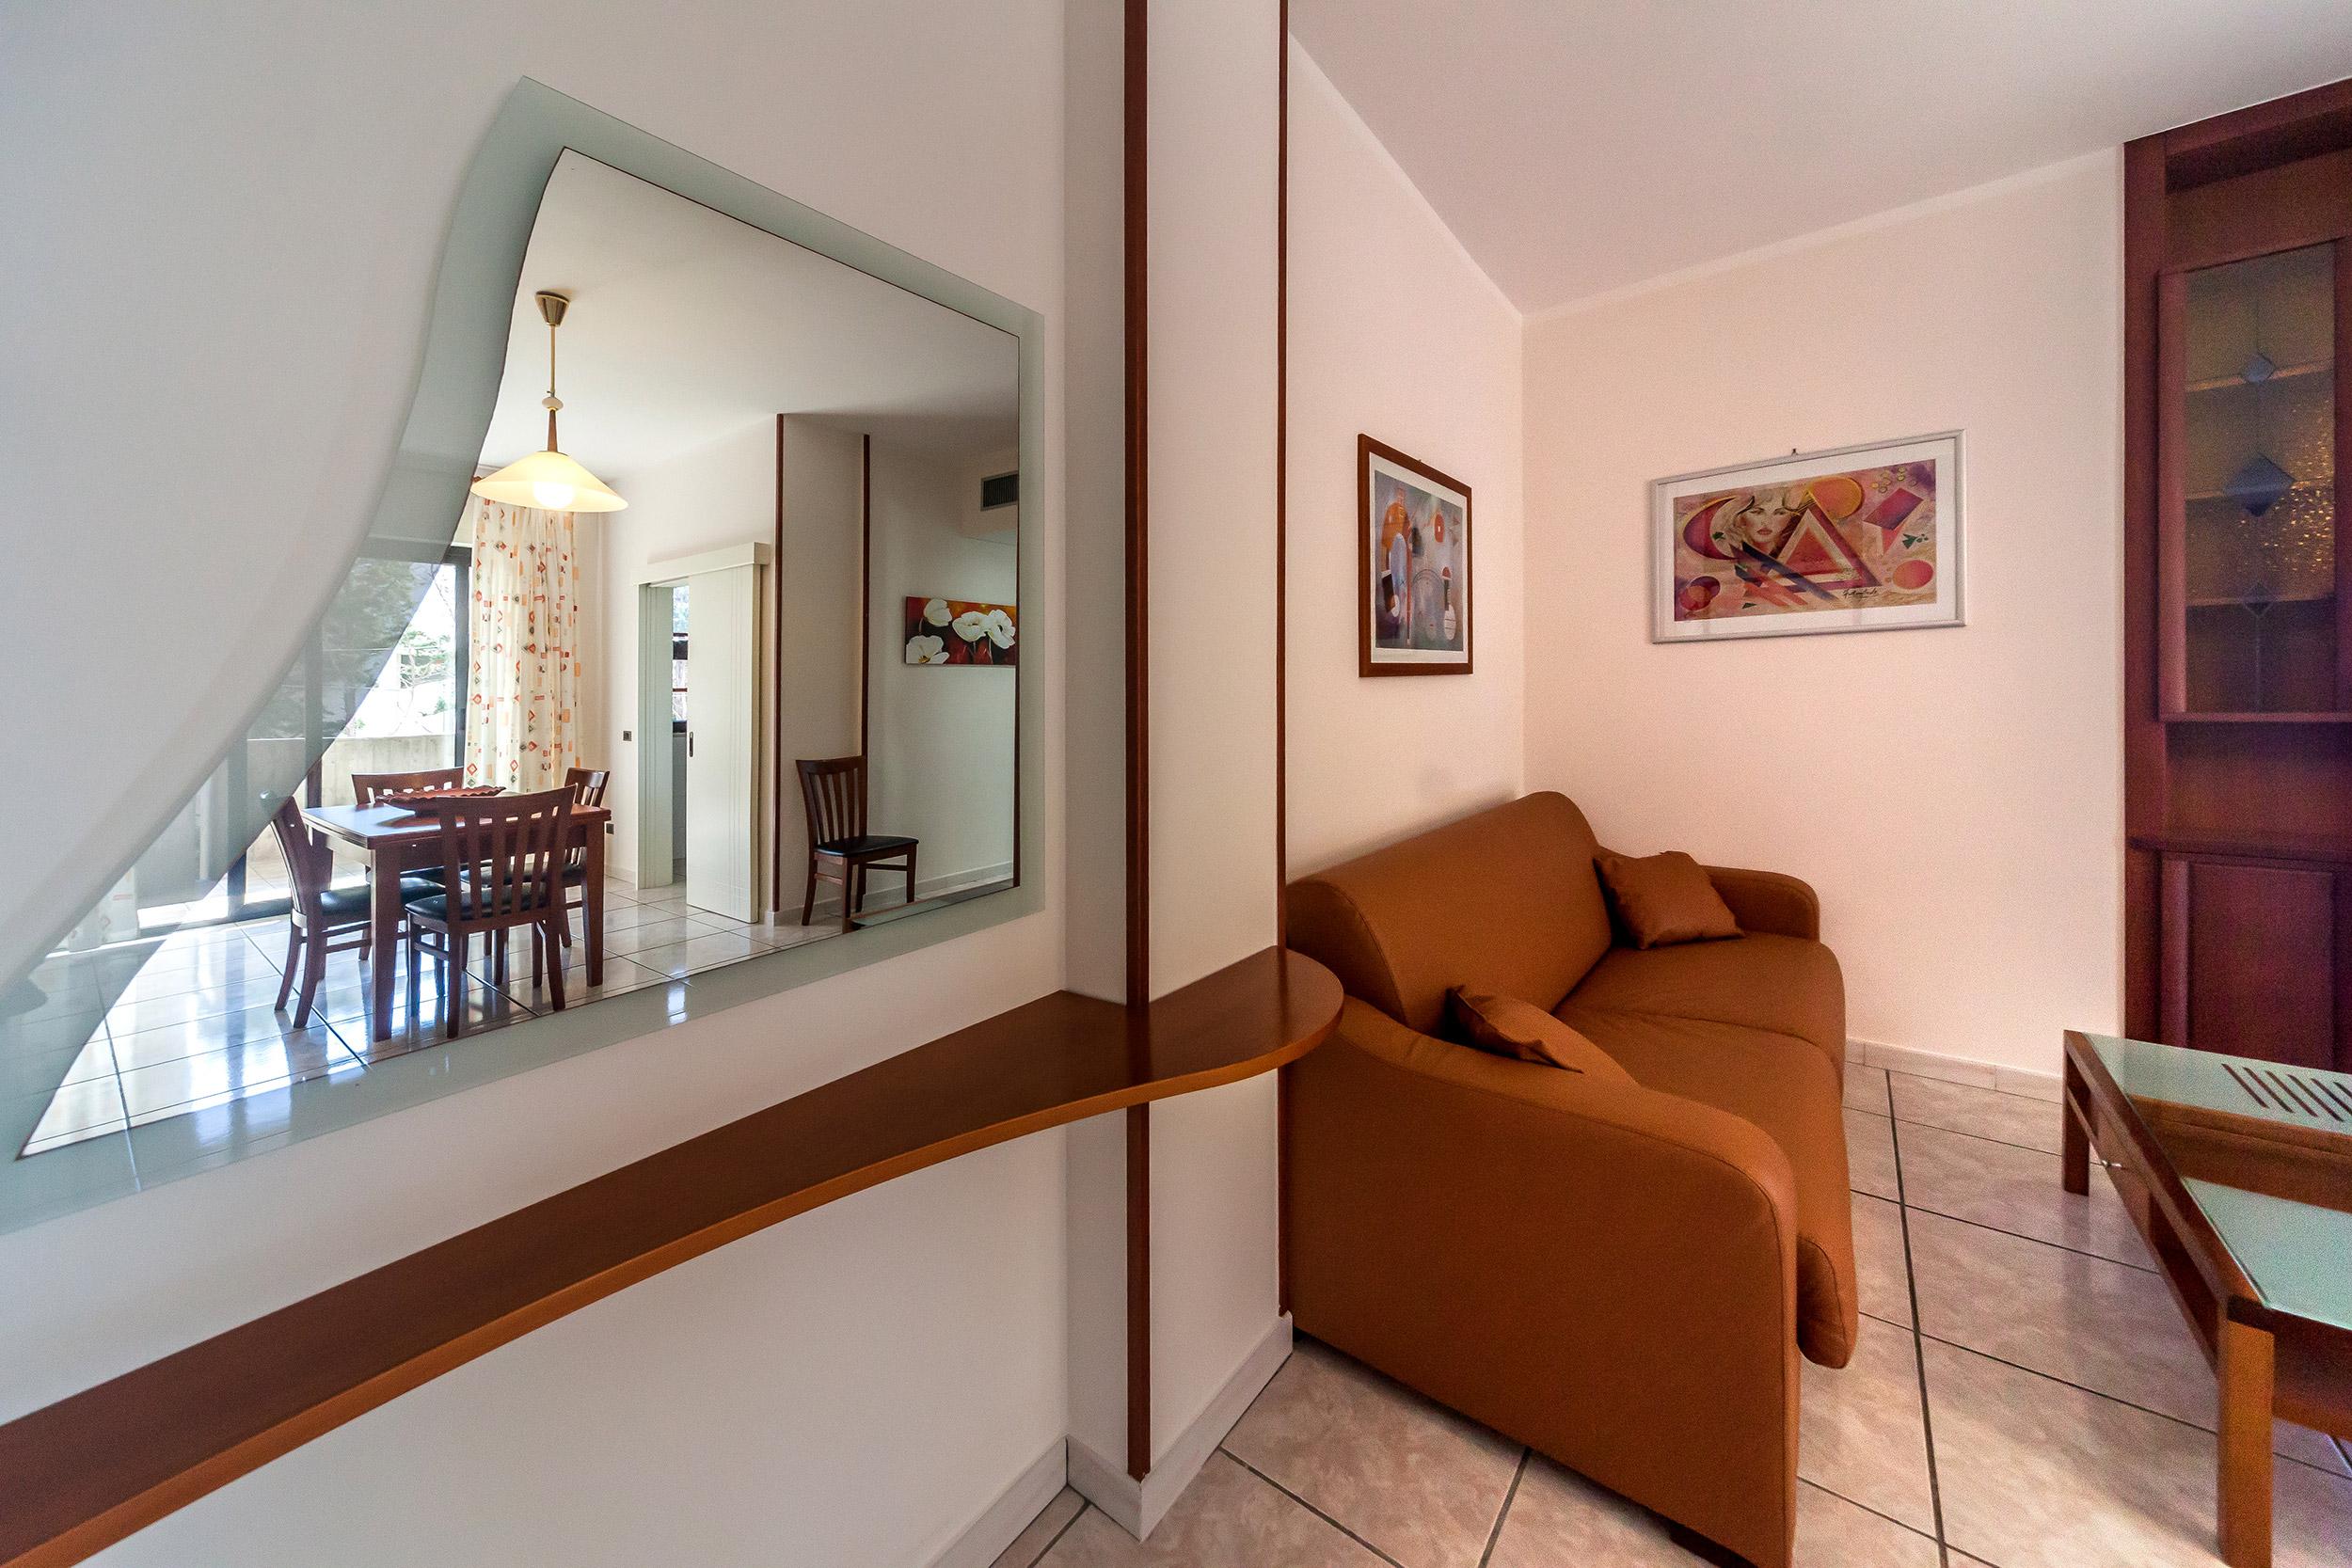 Ferienwohnung Appartamento vista mare a Gallipoli 4/6 posti - Baia Blu Side (2574458), Gallipoli, Lecce, Apulien, Italien, Bild 3